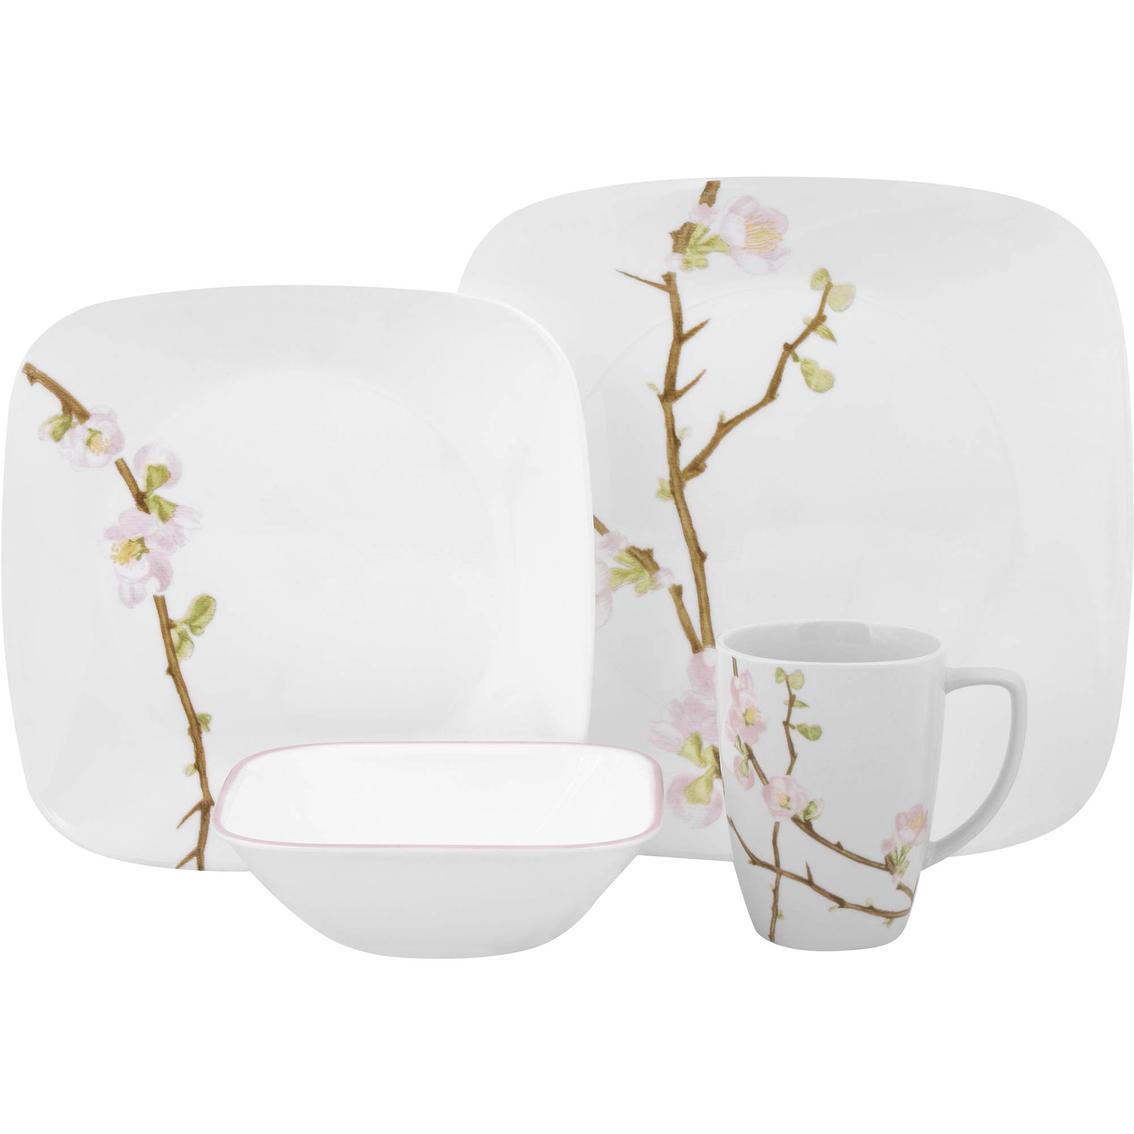 Corelle Cherry Blossom 16 pc. Dinnerware Set  sc 1 st  ShopMyExchange.com & Corelle Cherry Blossom 16 Pc. Dinnerware Set | Kitchen u0026 Dining ...